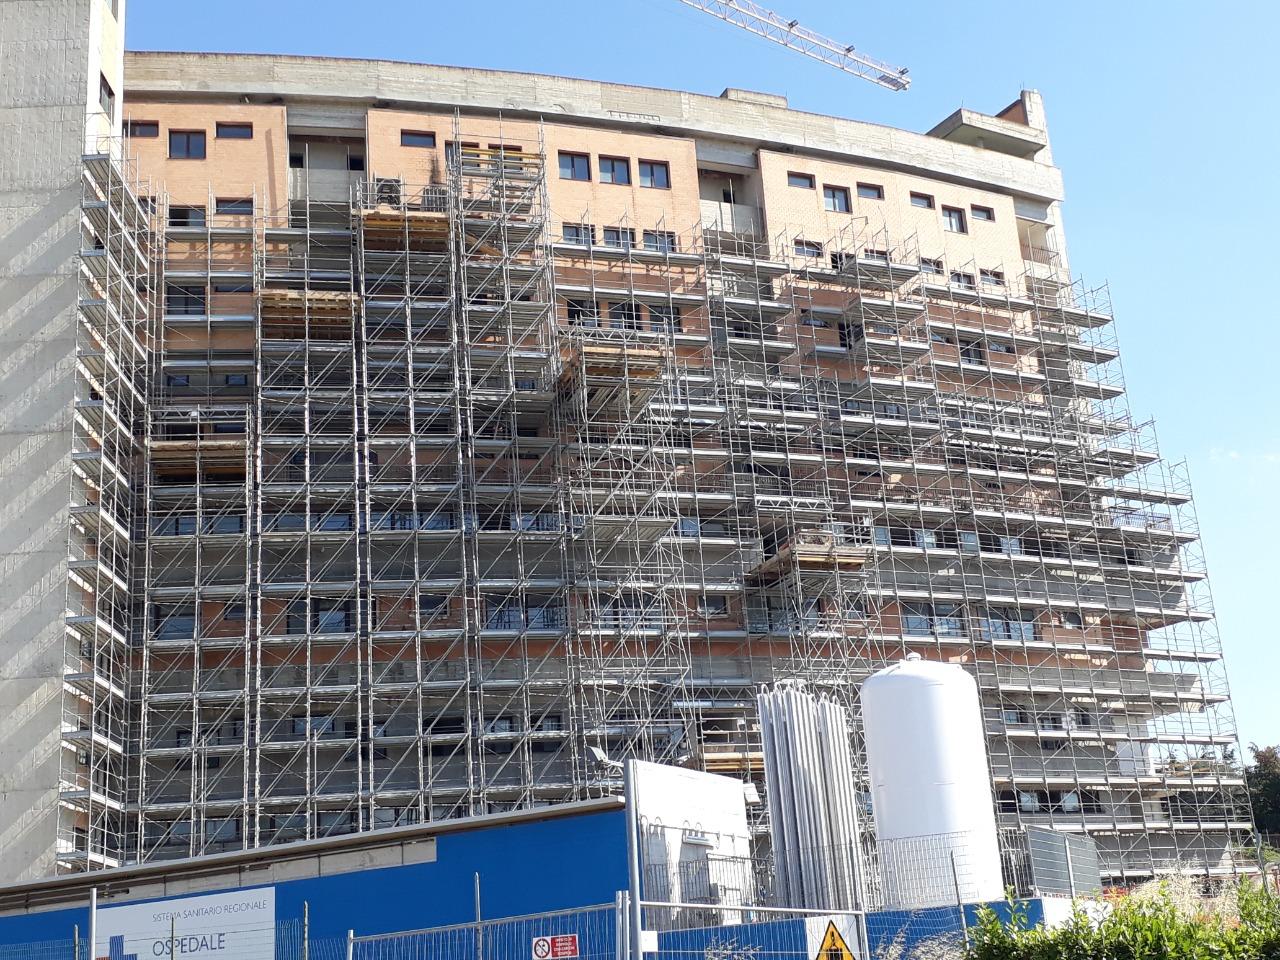 Gallery foto n.2 Torri Multiceta - consolidamento Ospedale